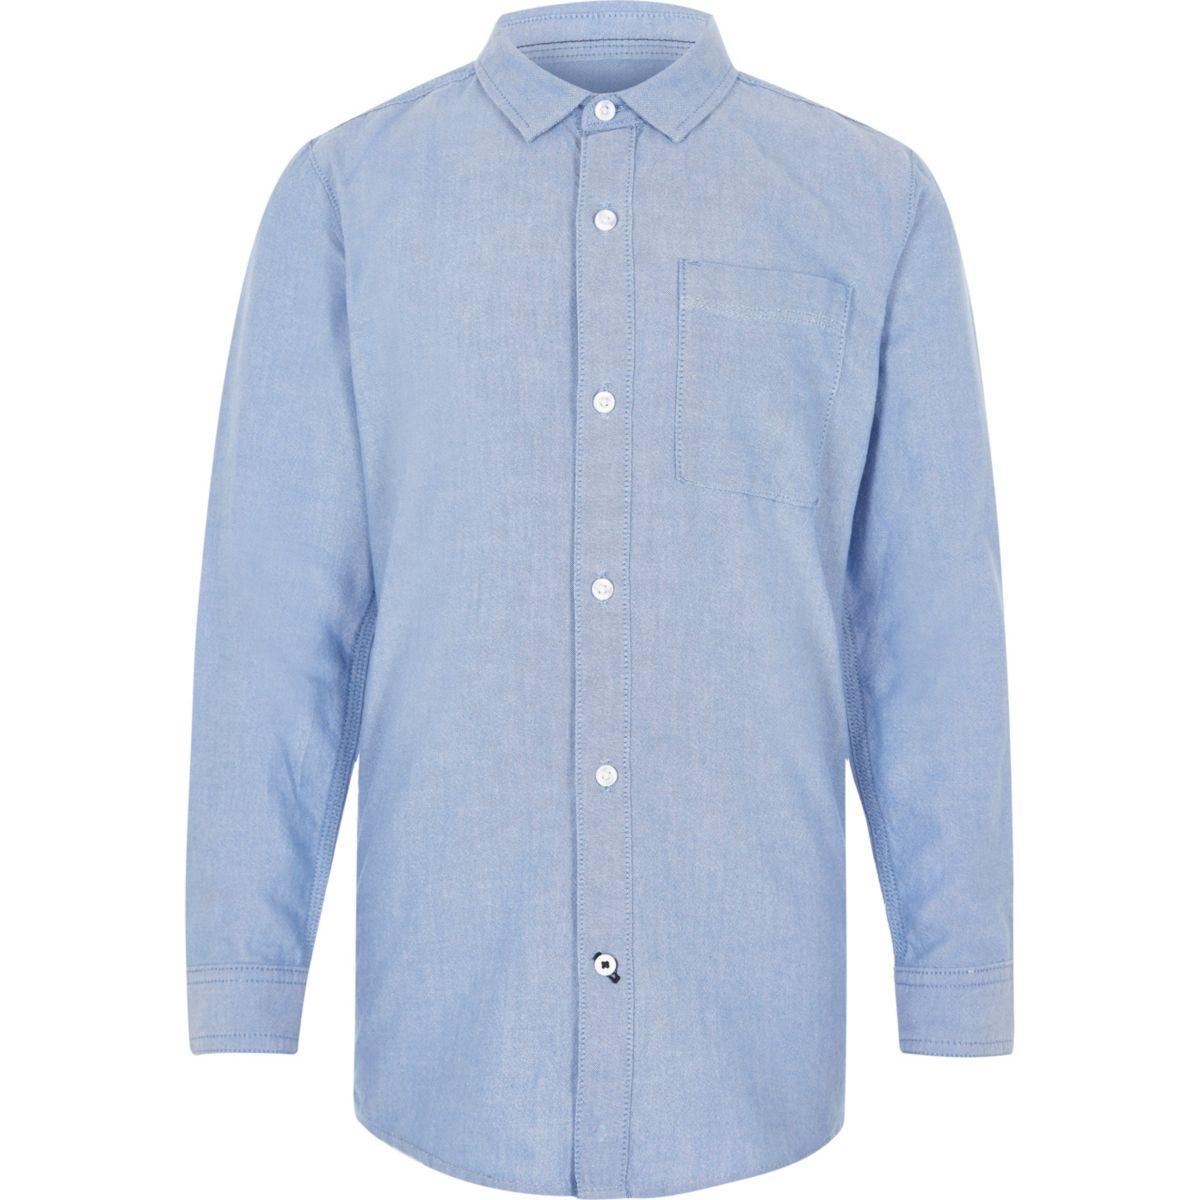 Boys blue long sleeve Oxford shirt